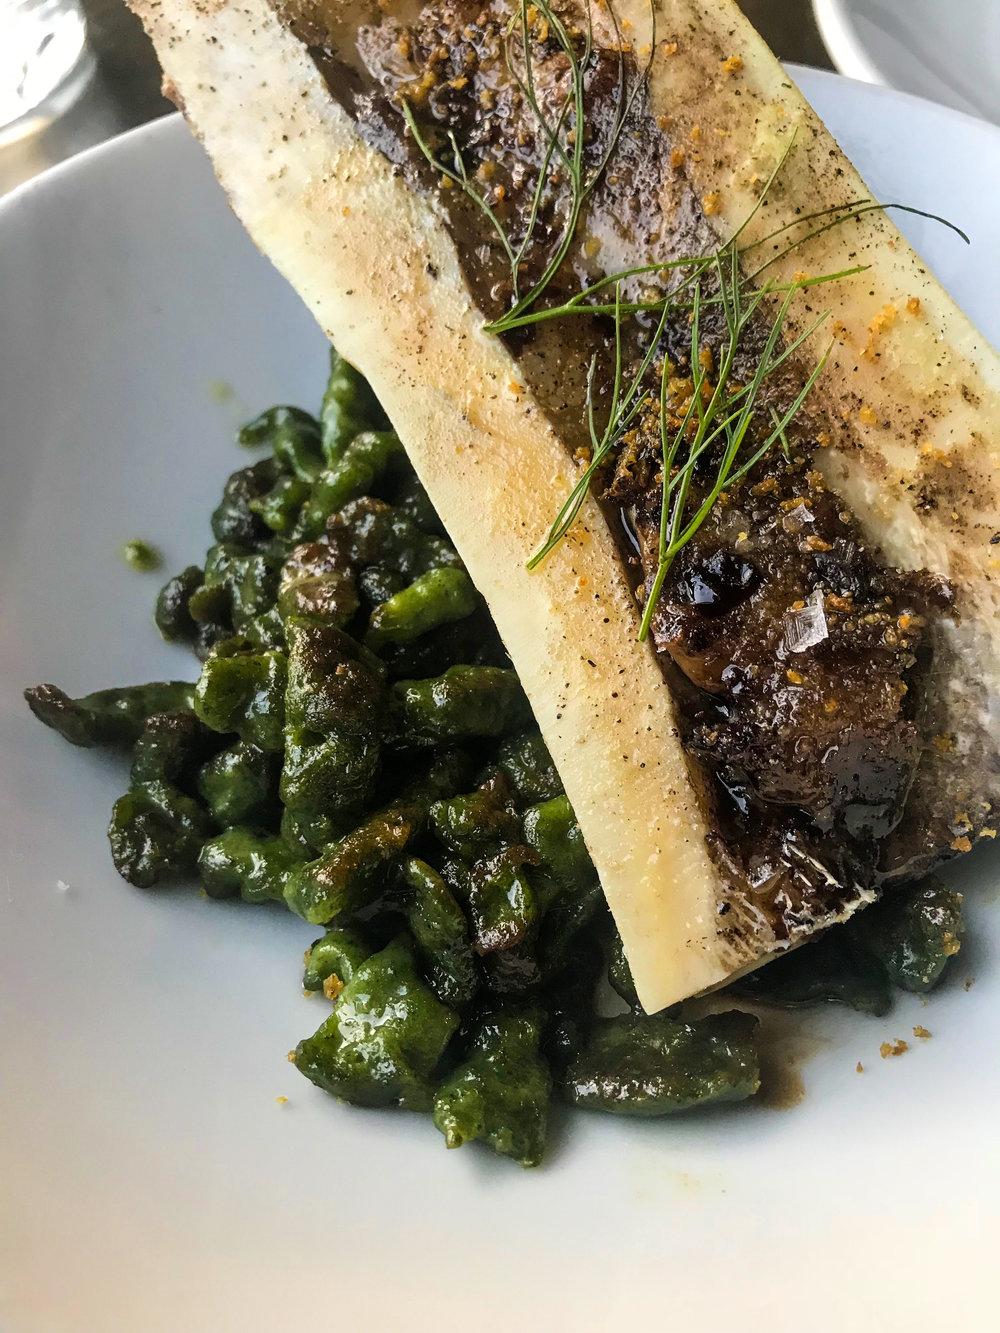 Roasted Marrow Bone from Bestia - Spinach gnocchetti,crispy breadcrumbs,aged balsamic.$19.00